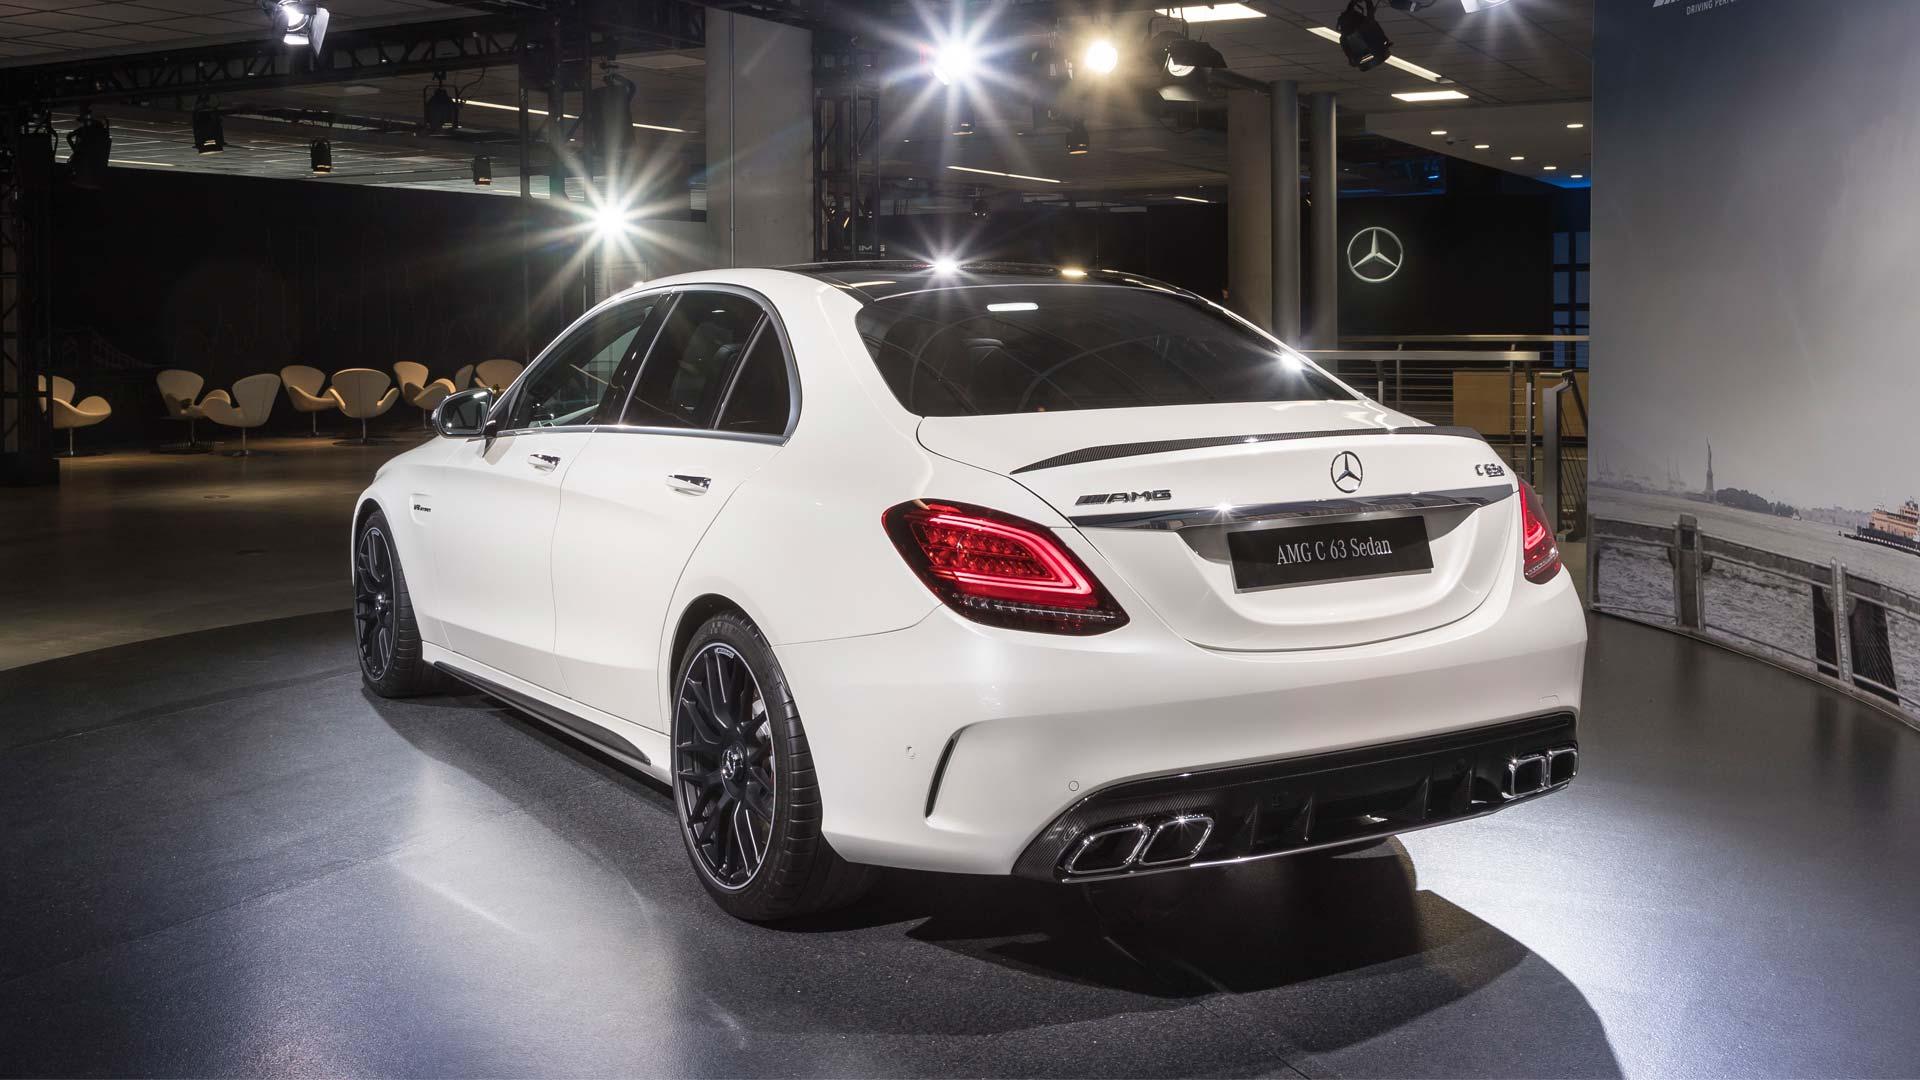 2019-Mercedes-AMG-C-63-S-Saloon_2